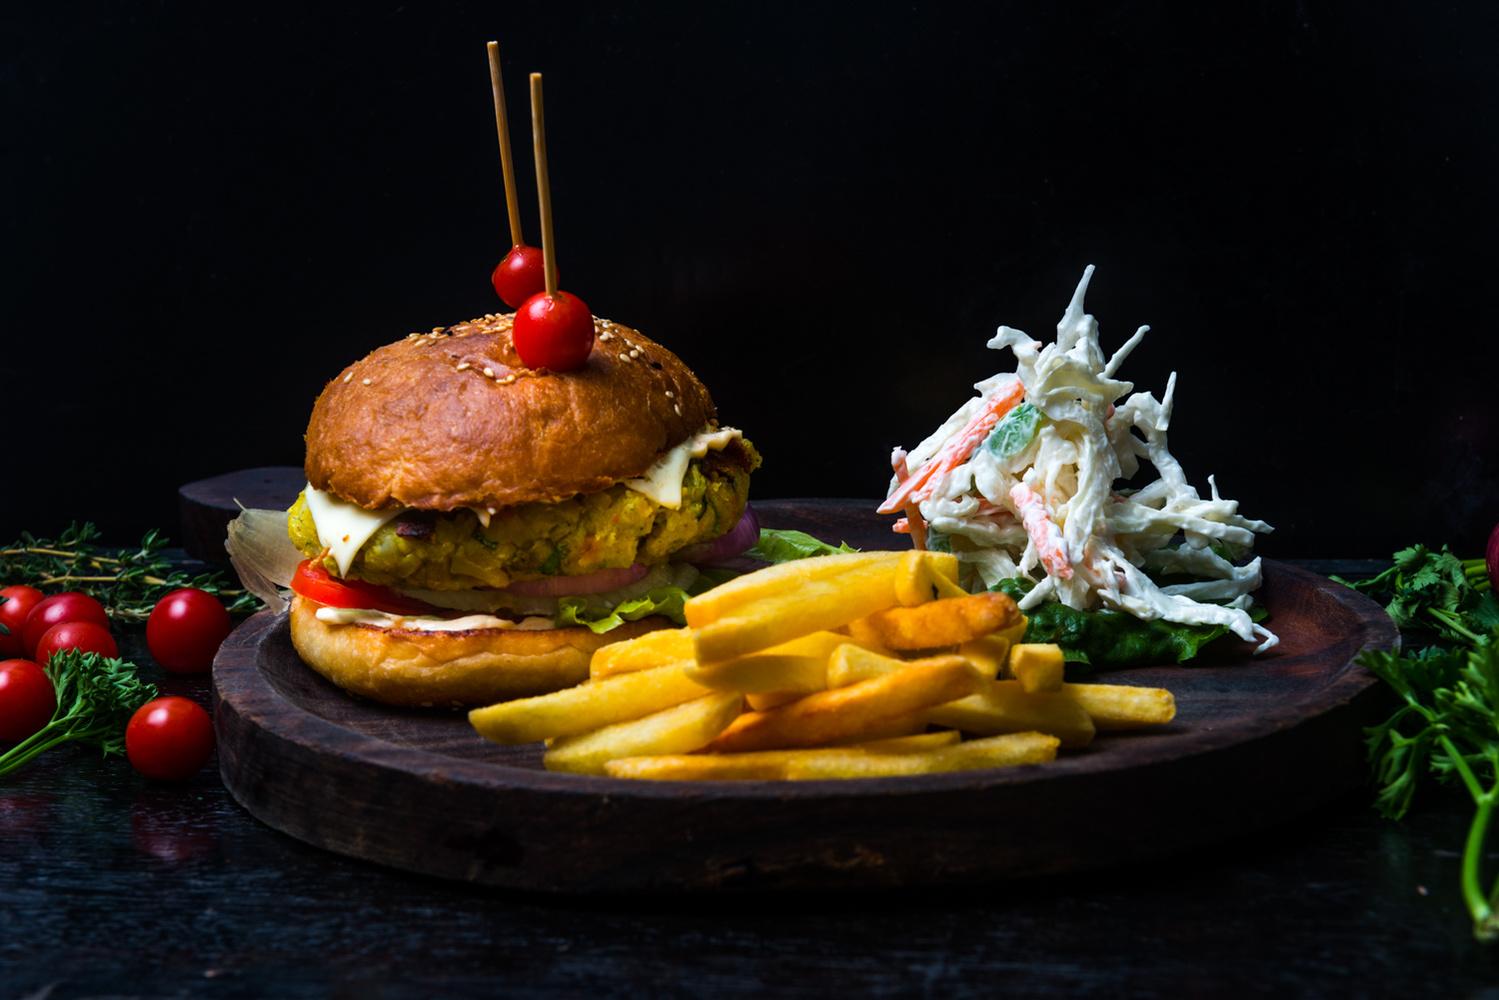 Burger by Palash Bakshi